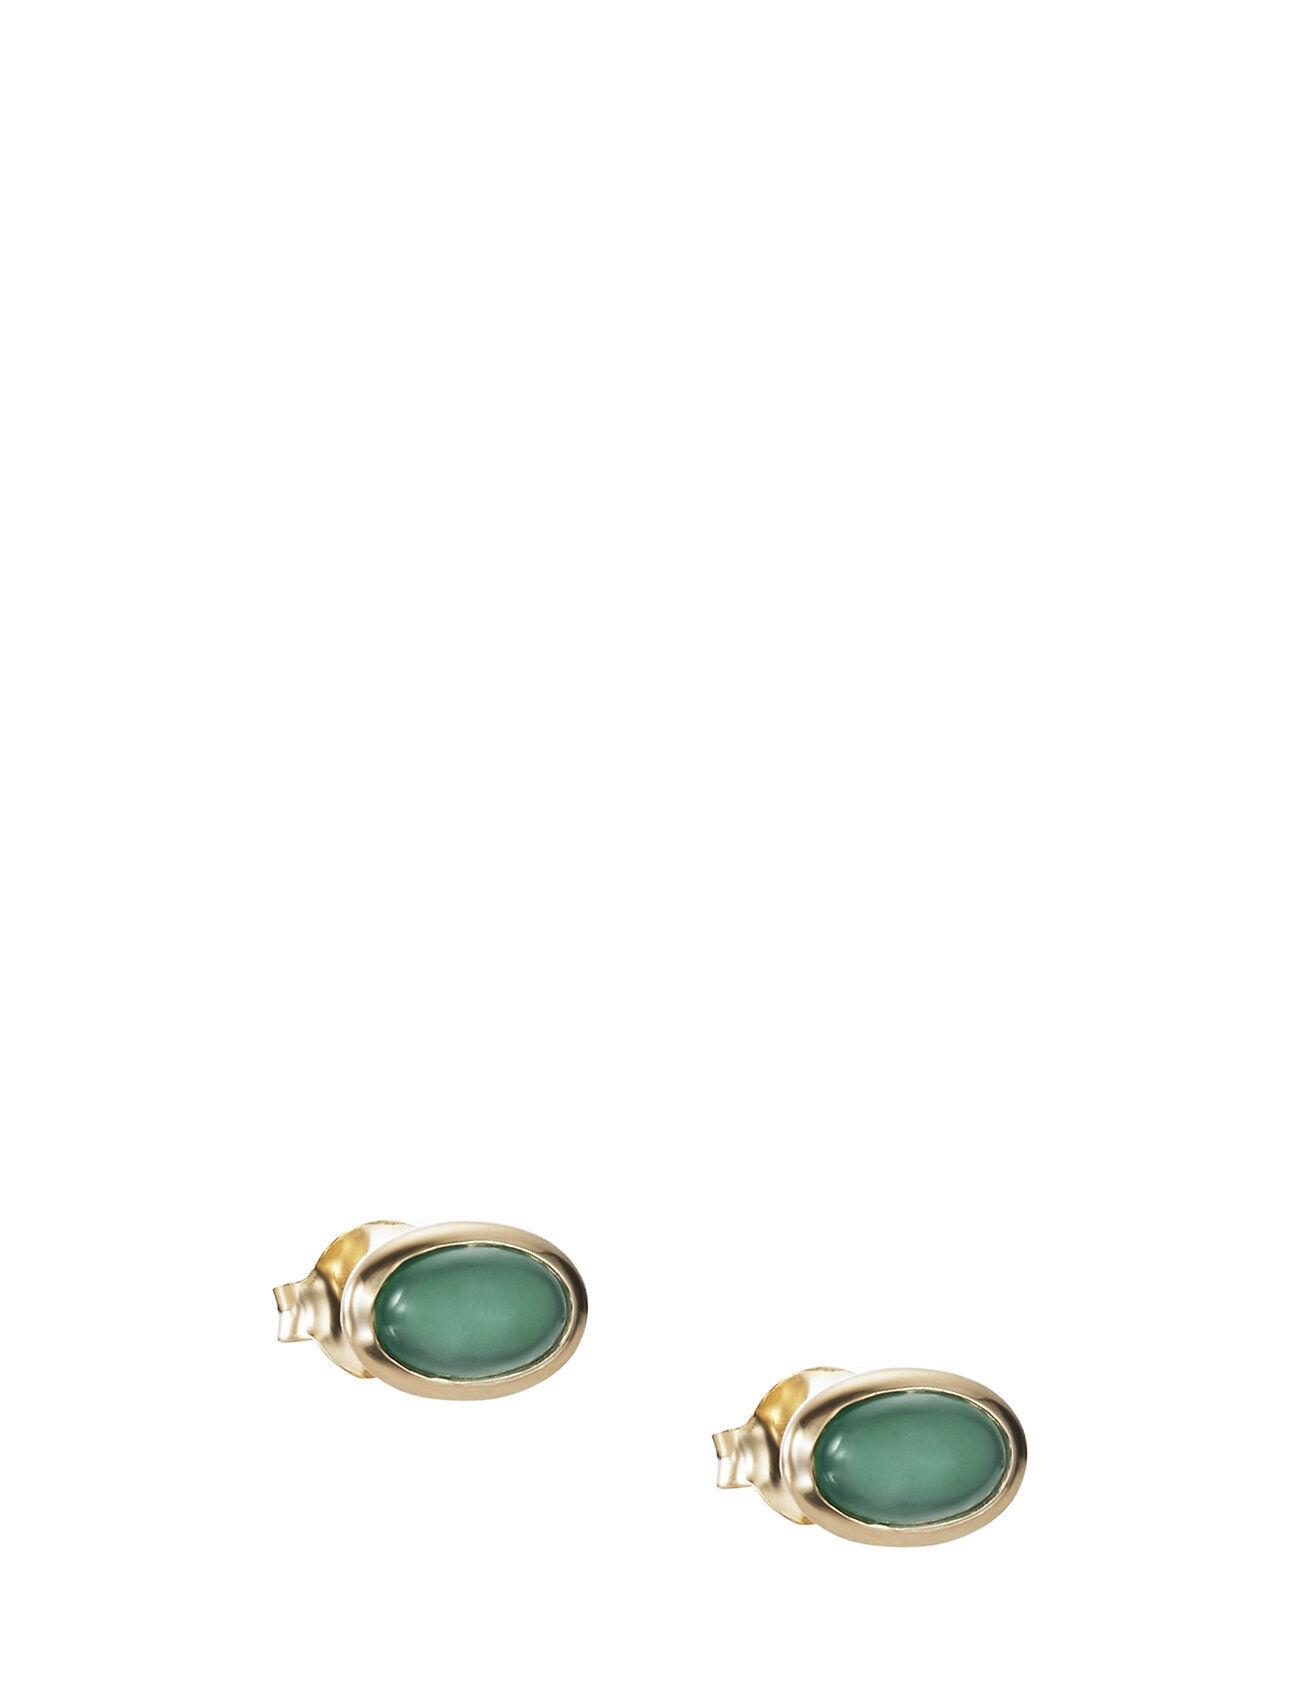 Efva Attling Love Bead Ear - Green Agate